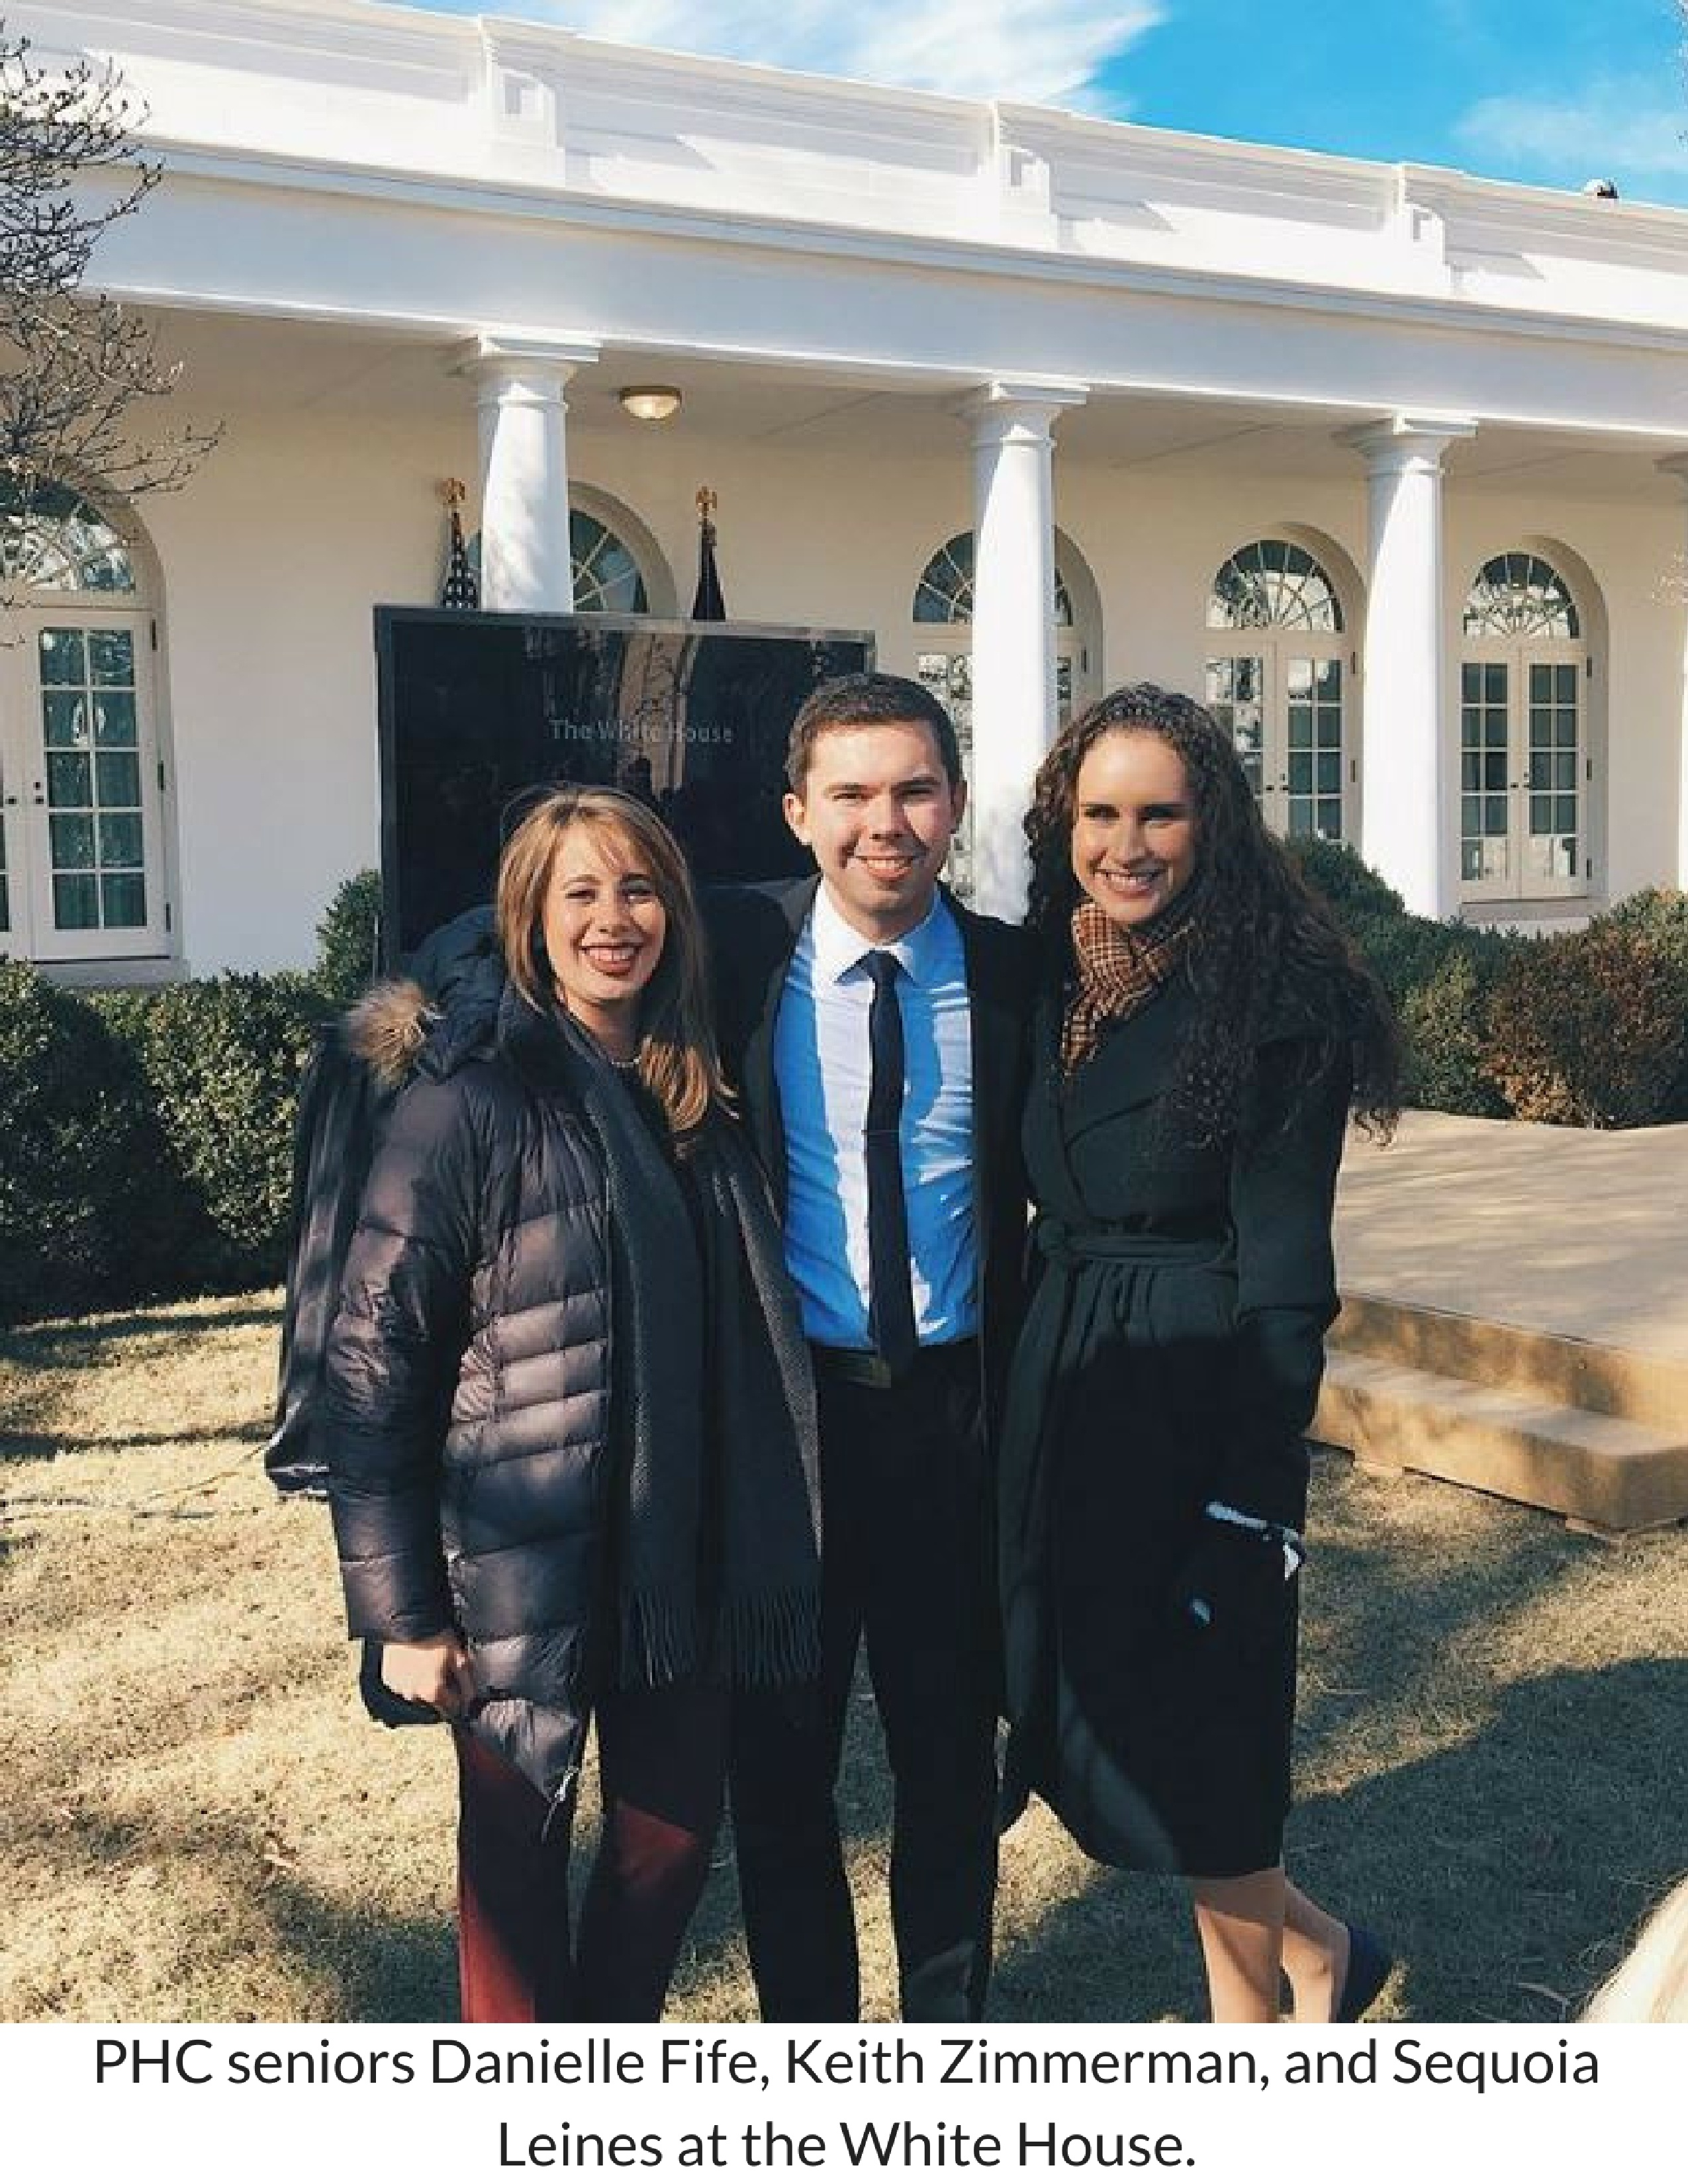 PHC seniors Danielle Fife, Keith Zimmerman, and Sequoia Linesat the White House..jpg